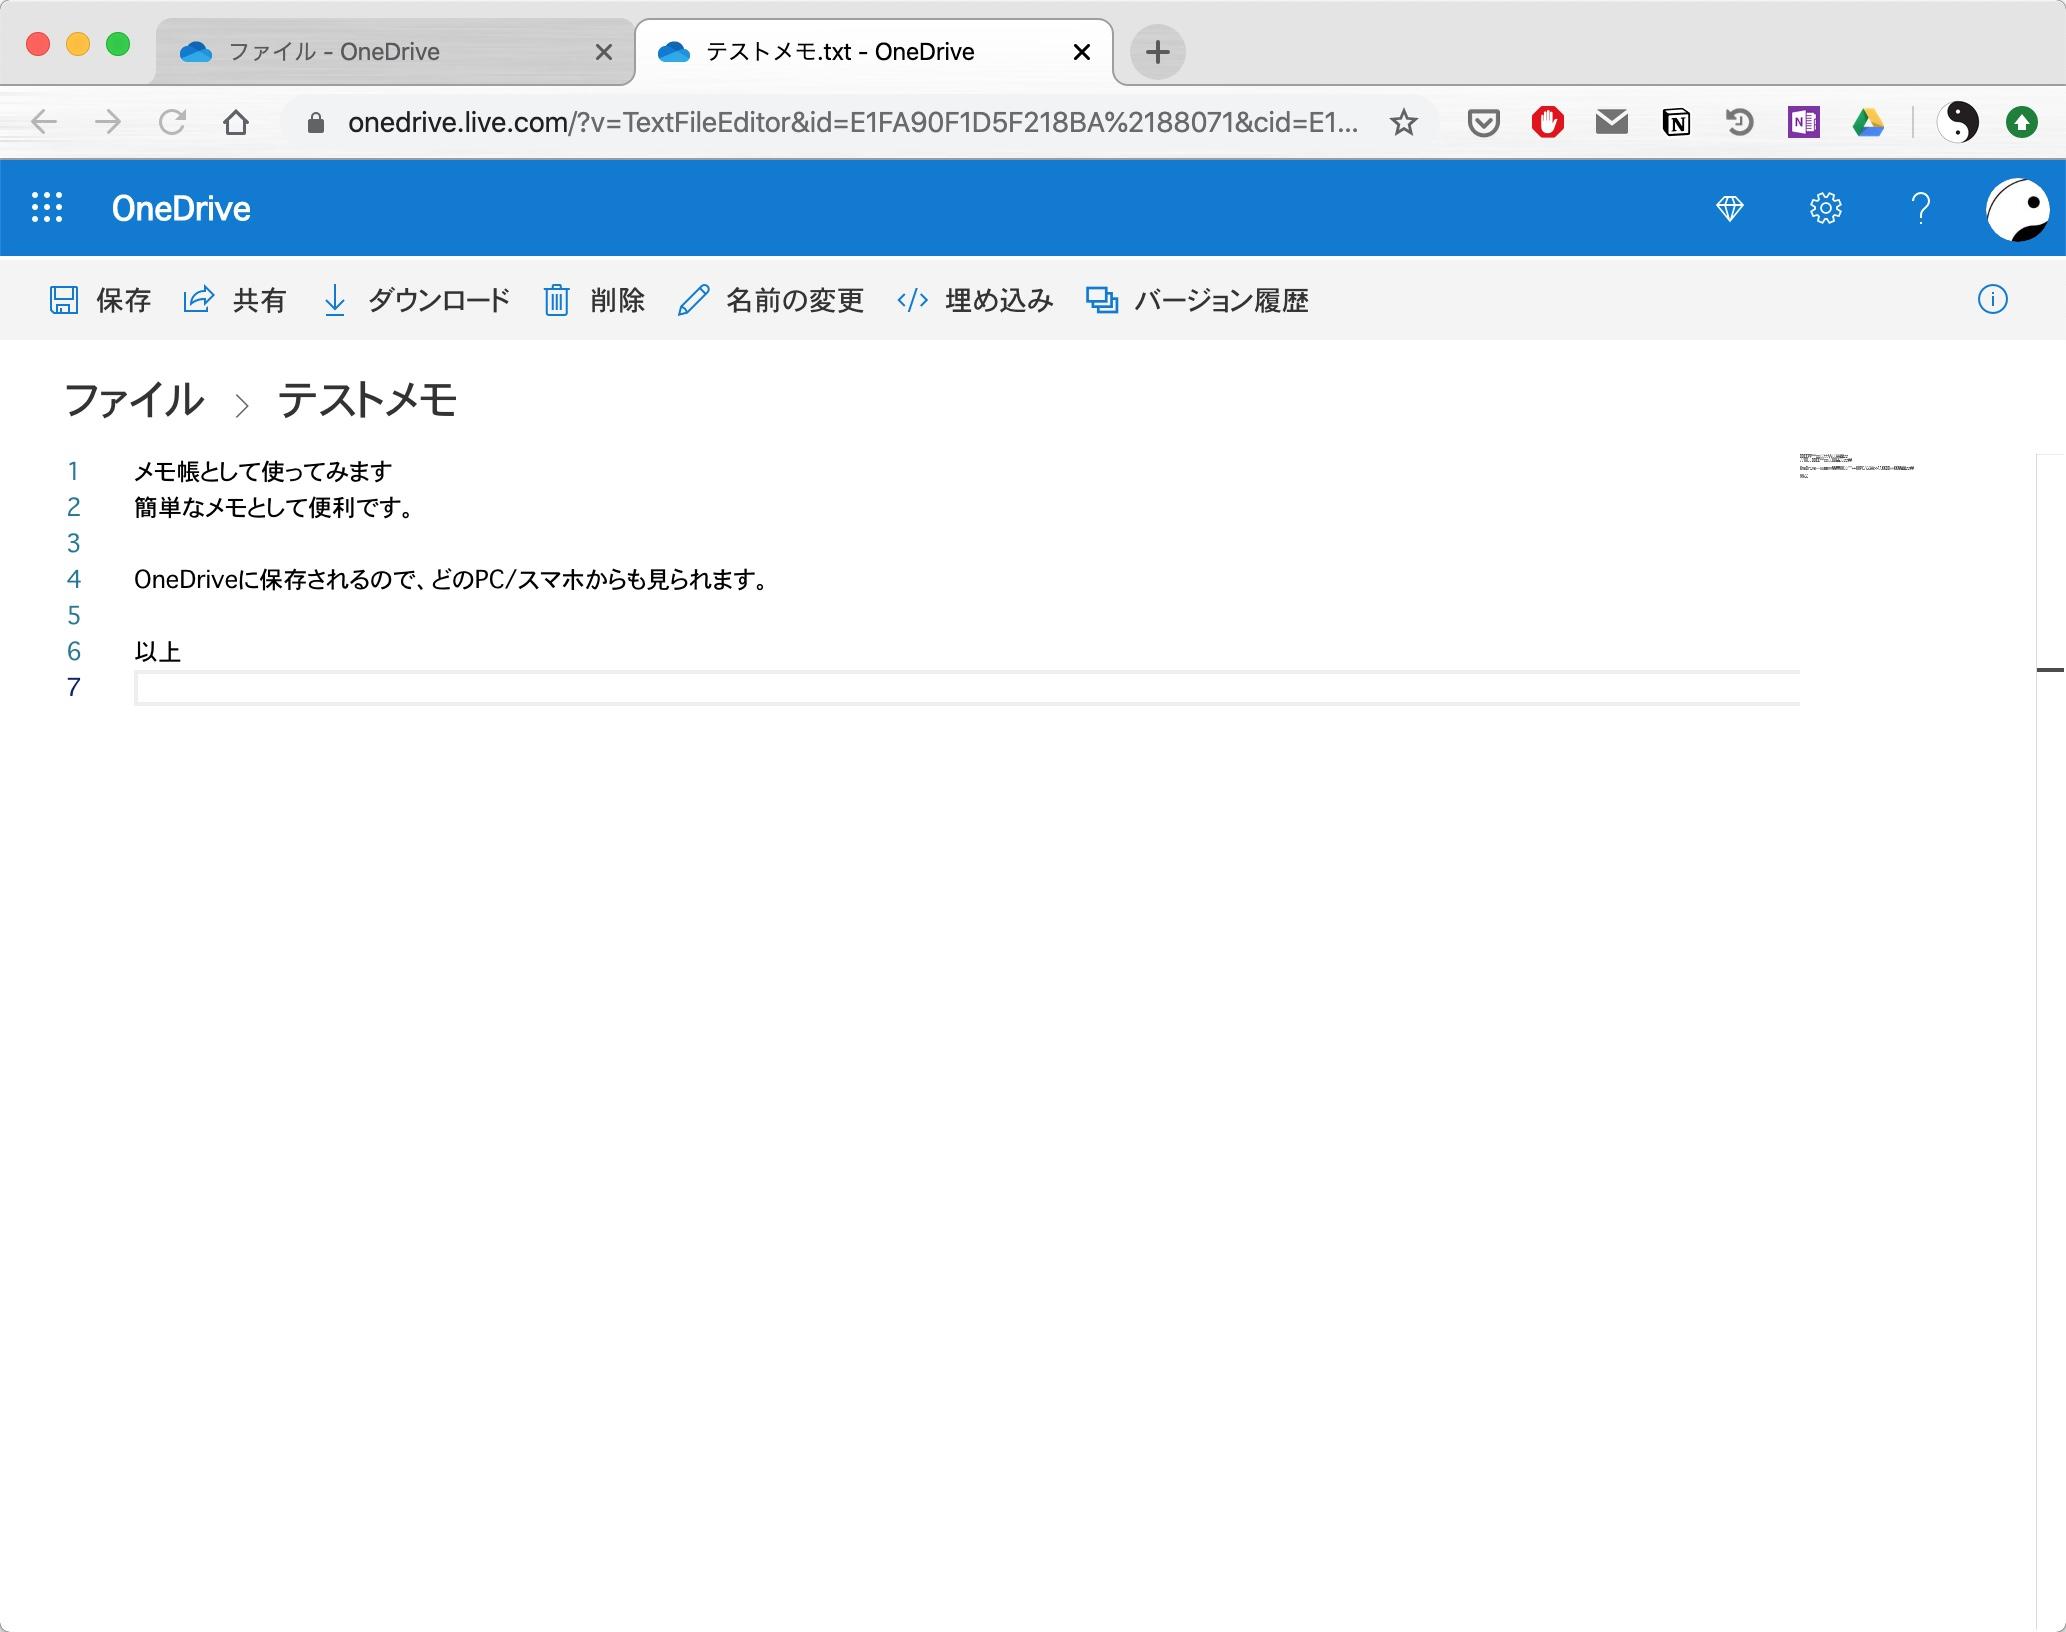 OneDriveでテキスト形式のドキュメントを新規作成